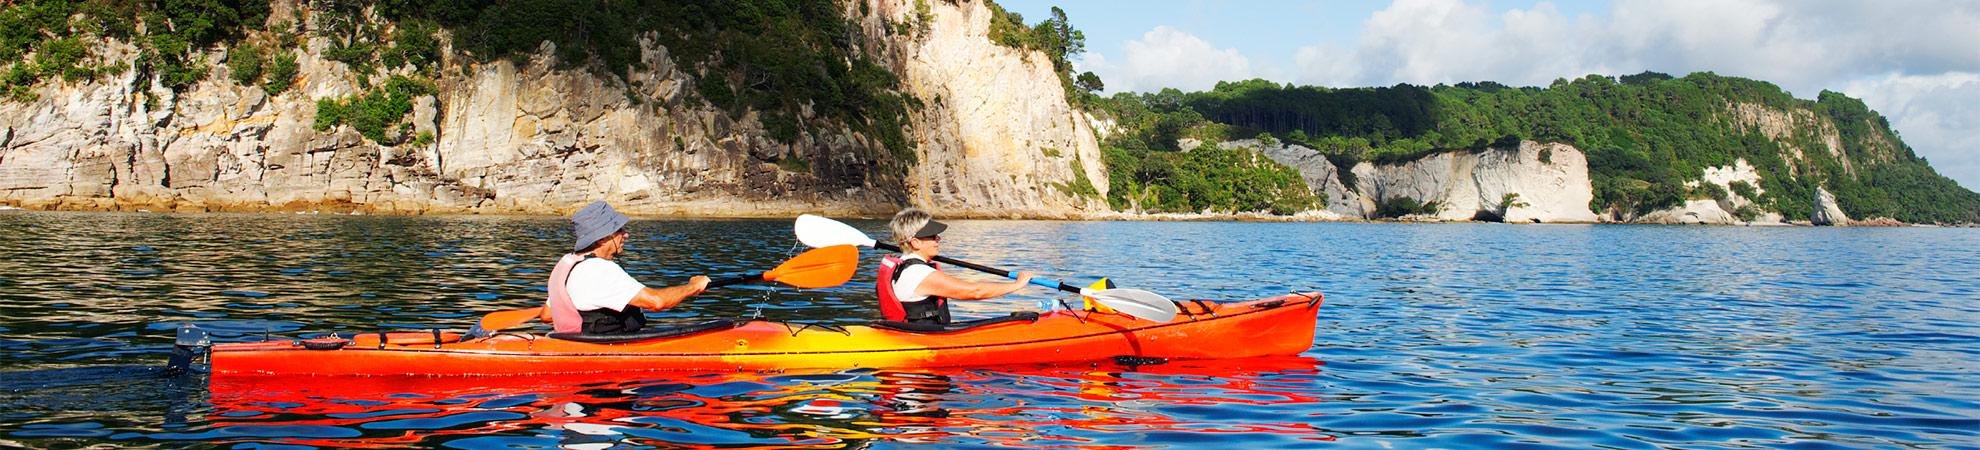 Kayak de mer sur la péninsule de Coromandel